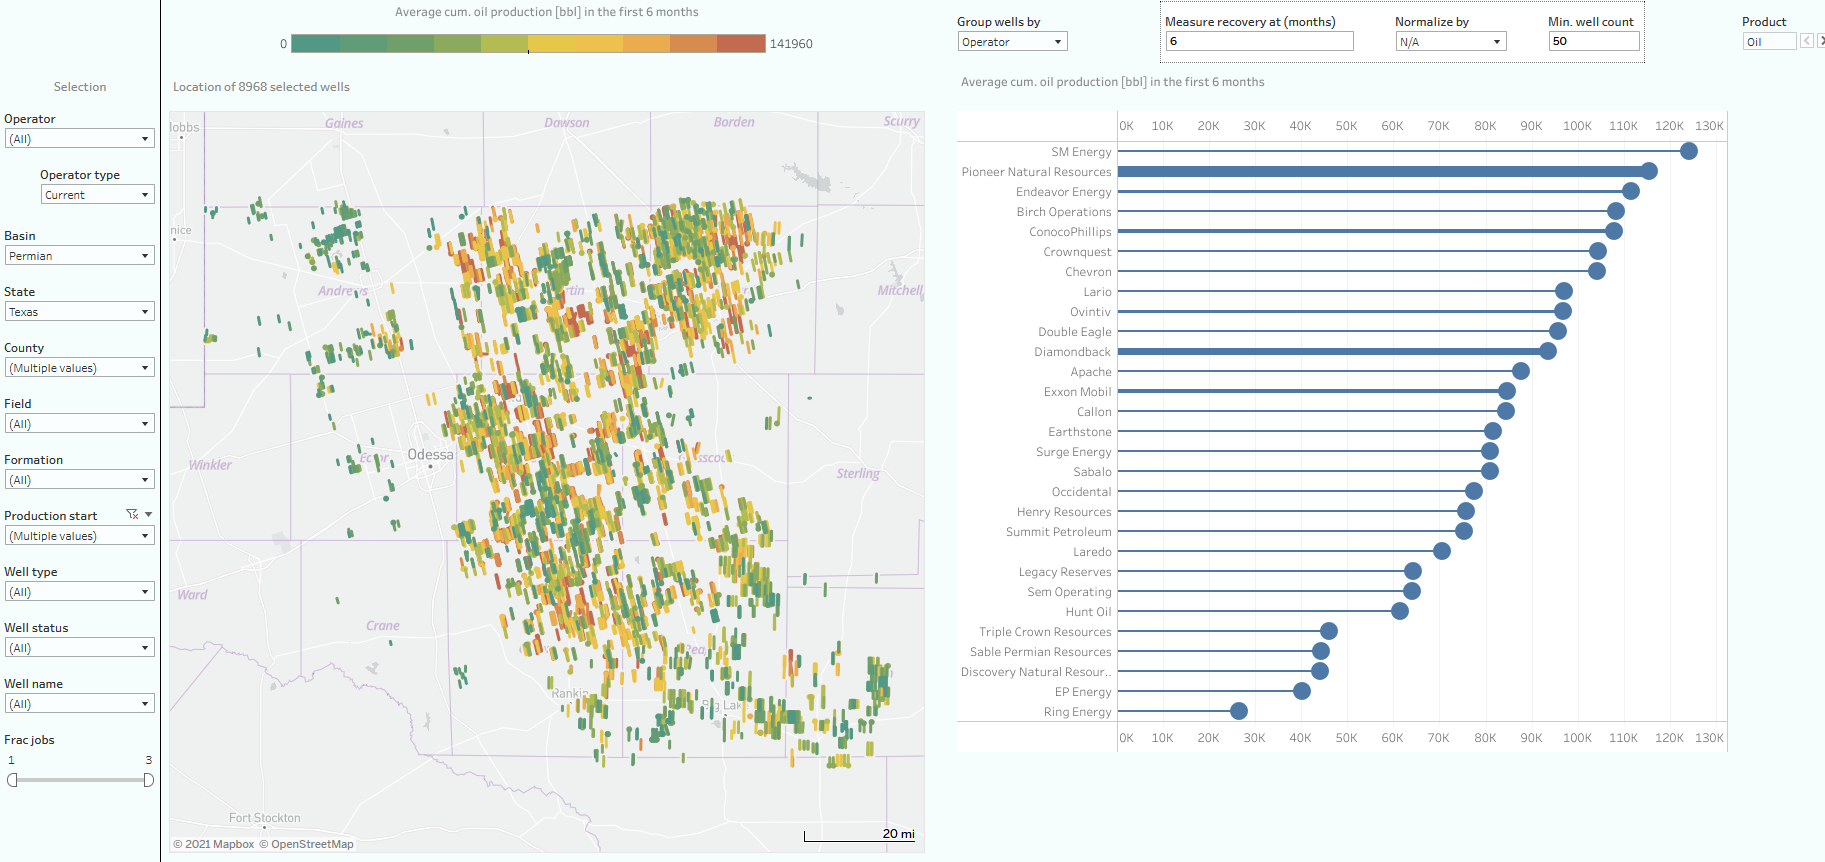 Midland-Basin-productivity-ranking.png